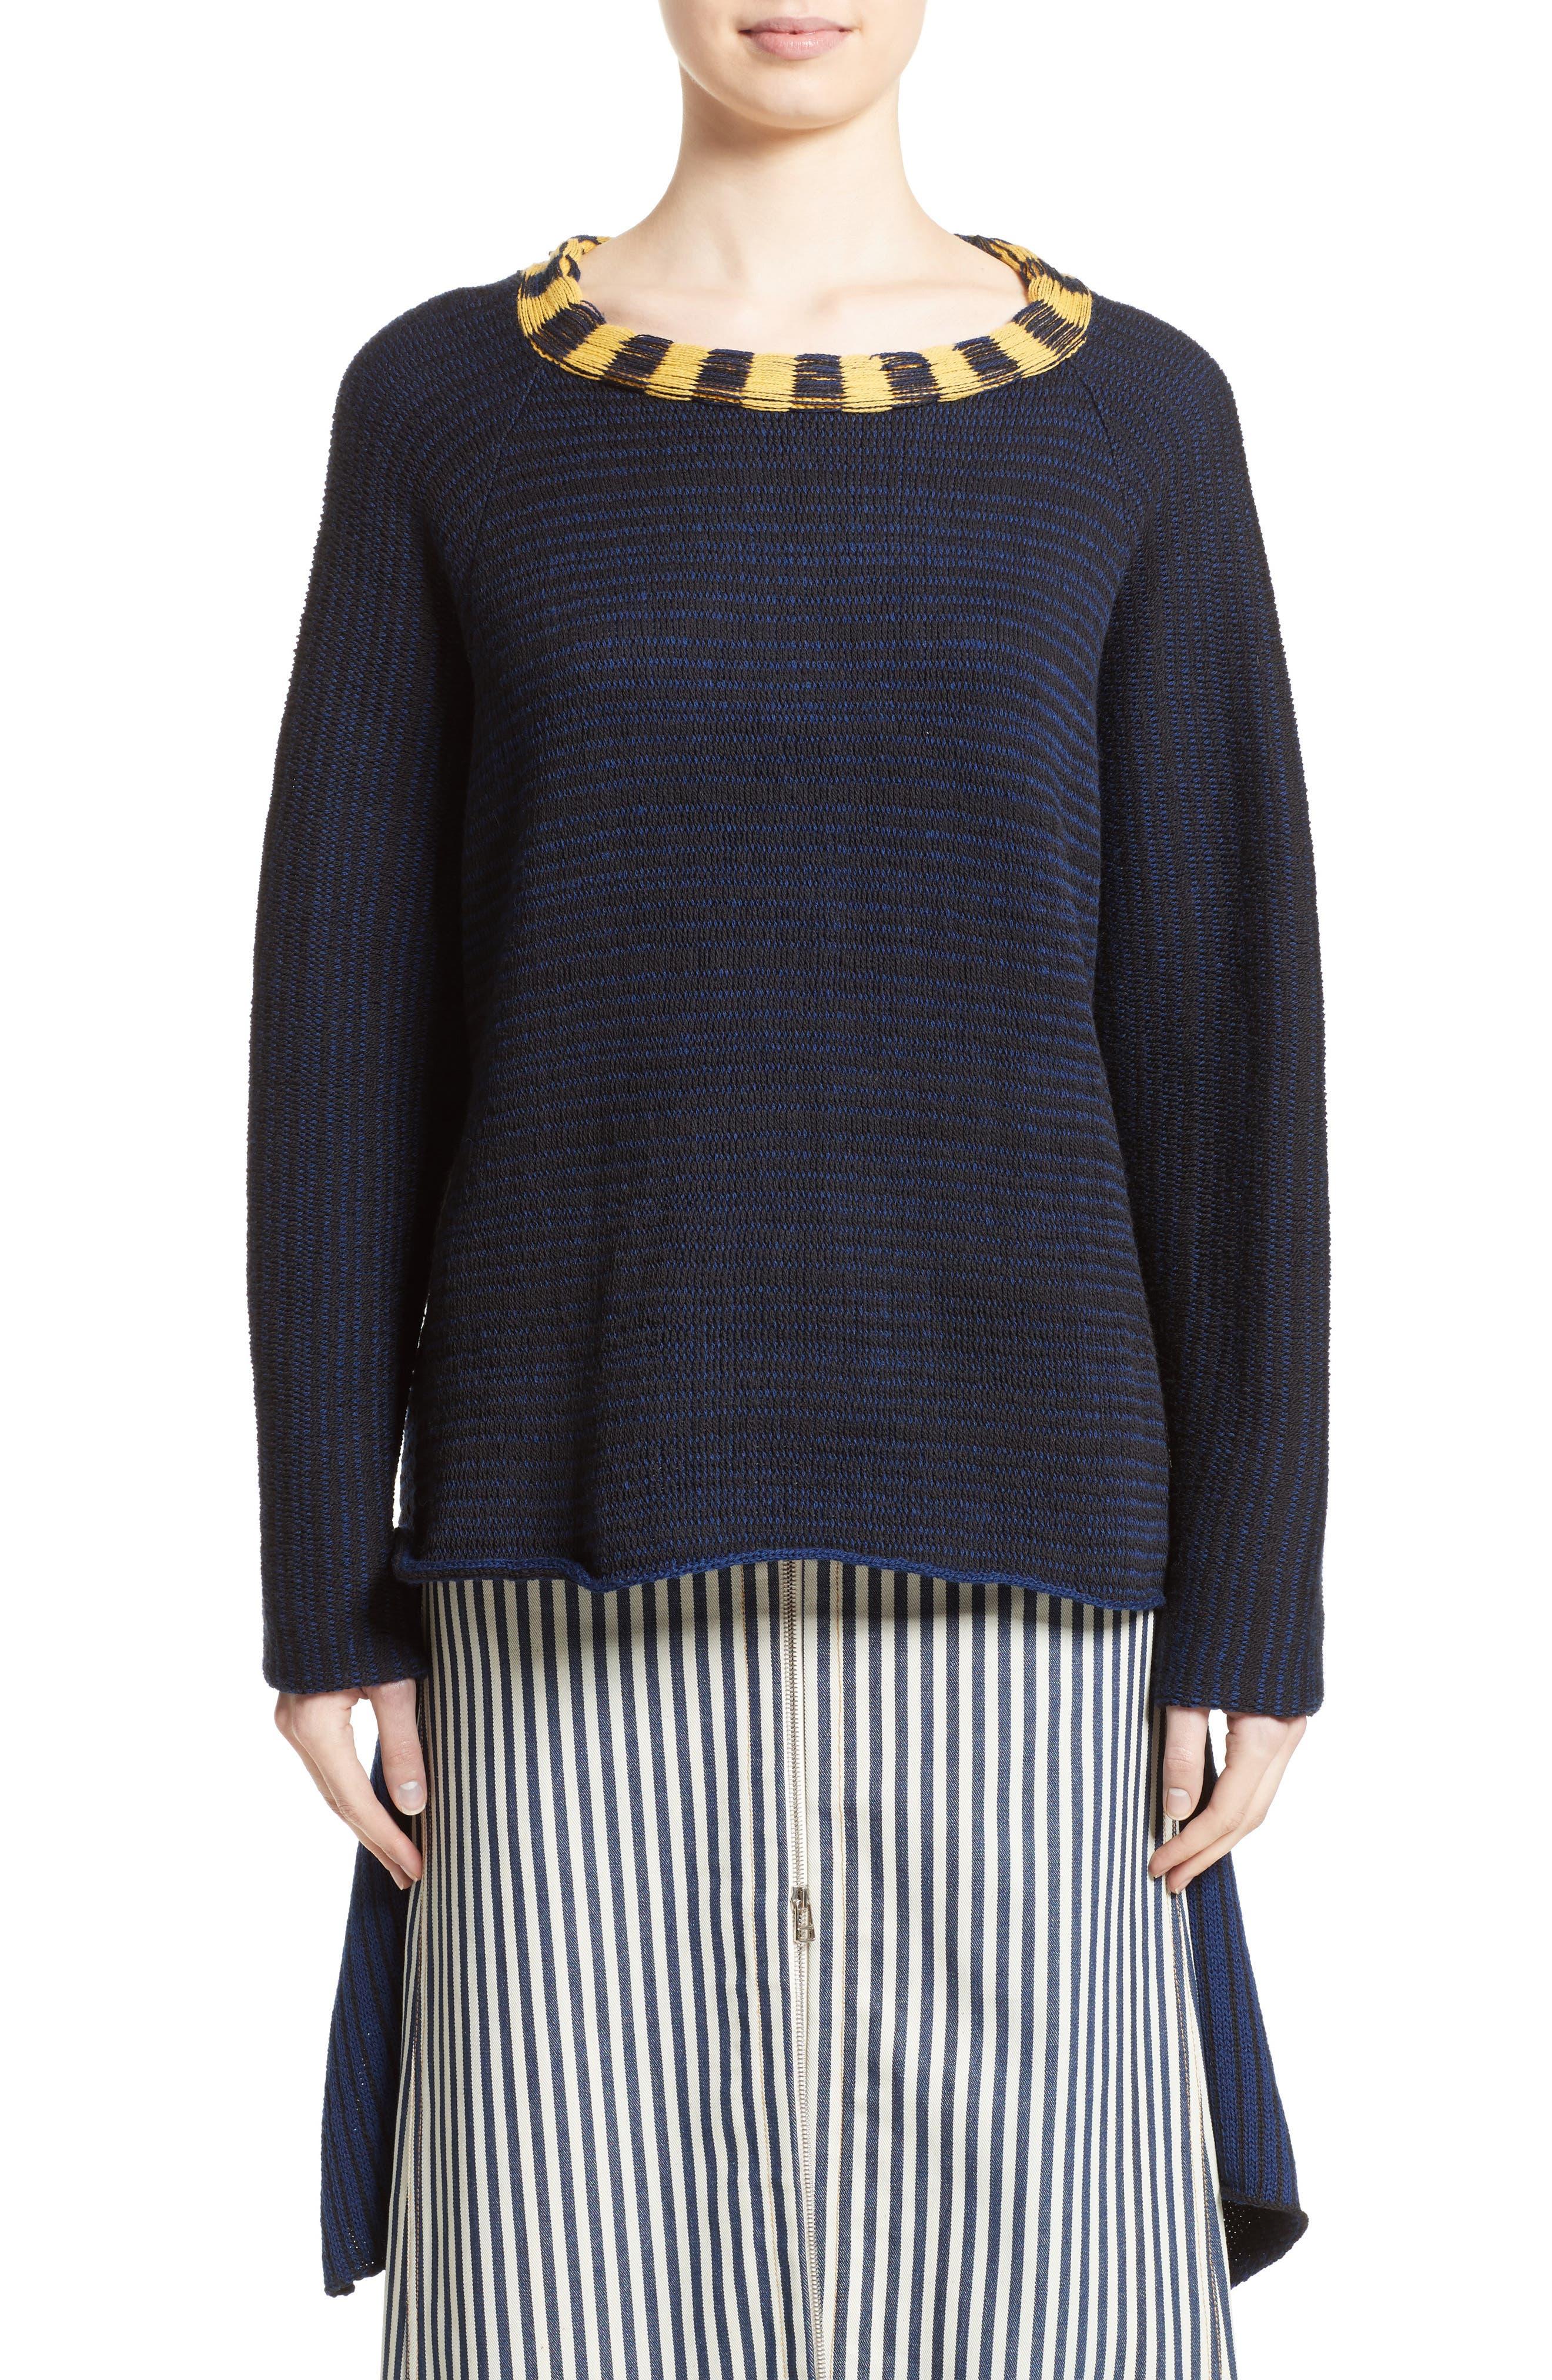 Alternate Image 1 Selected - Eckhaus Latta Tie Back Sweater